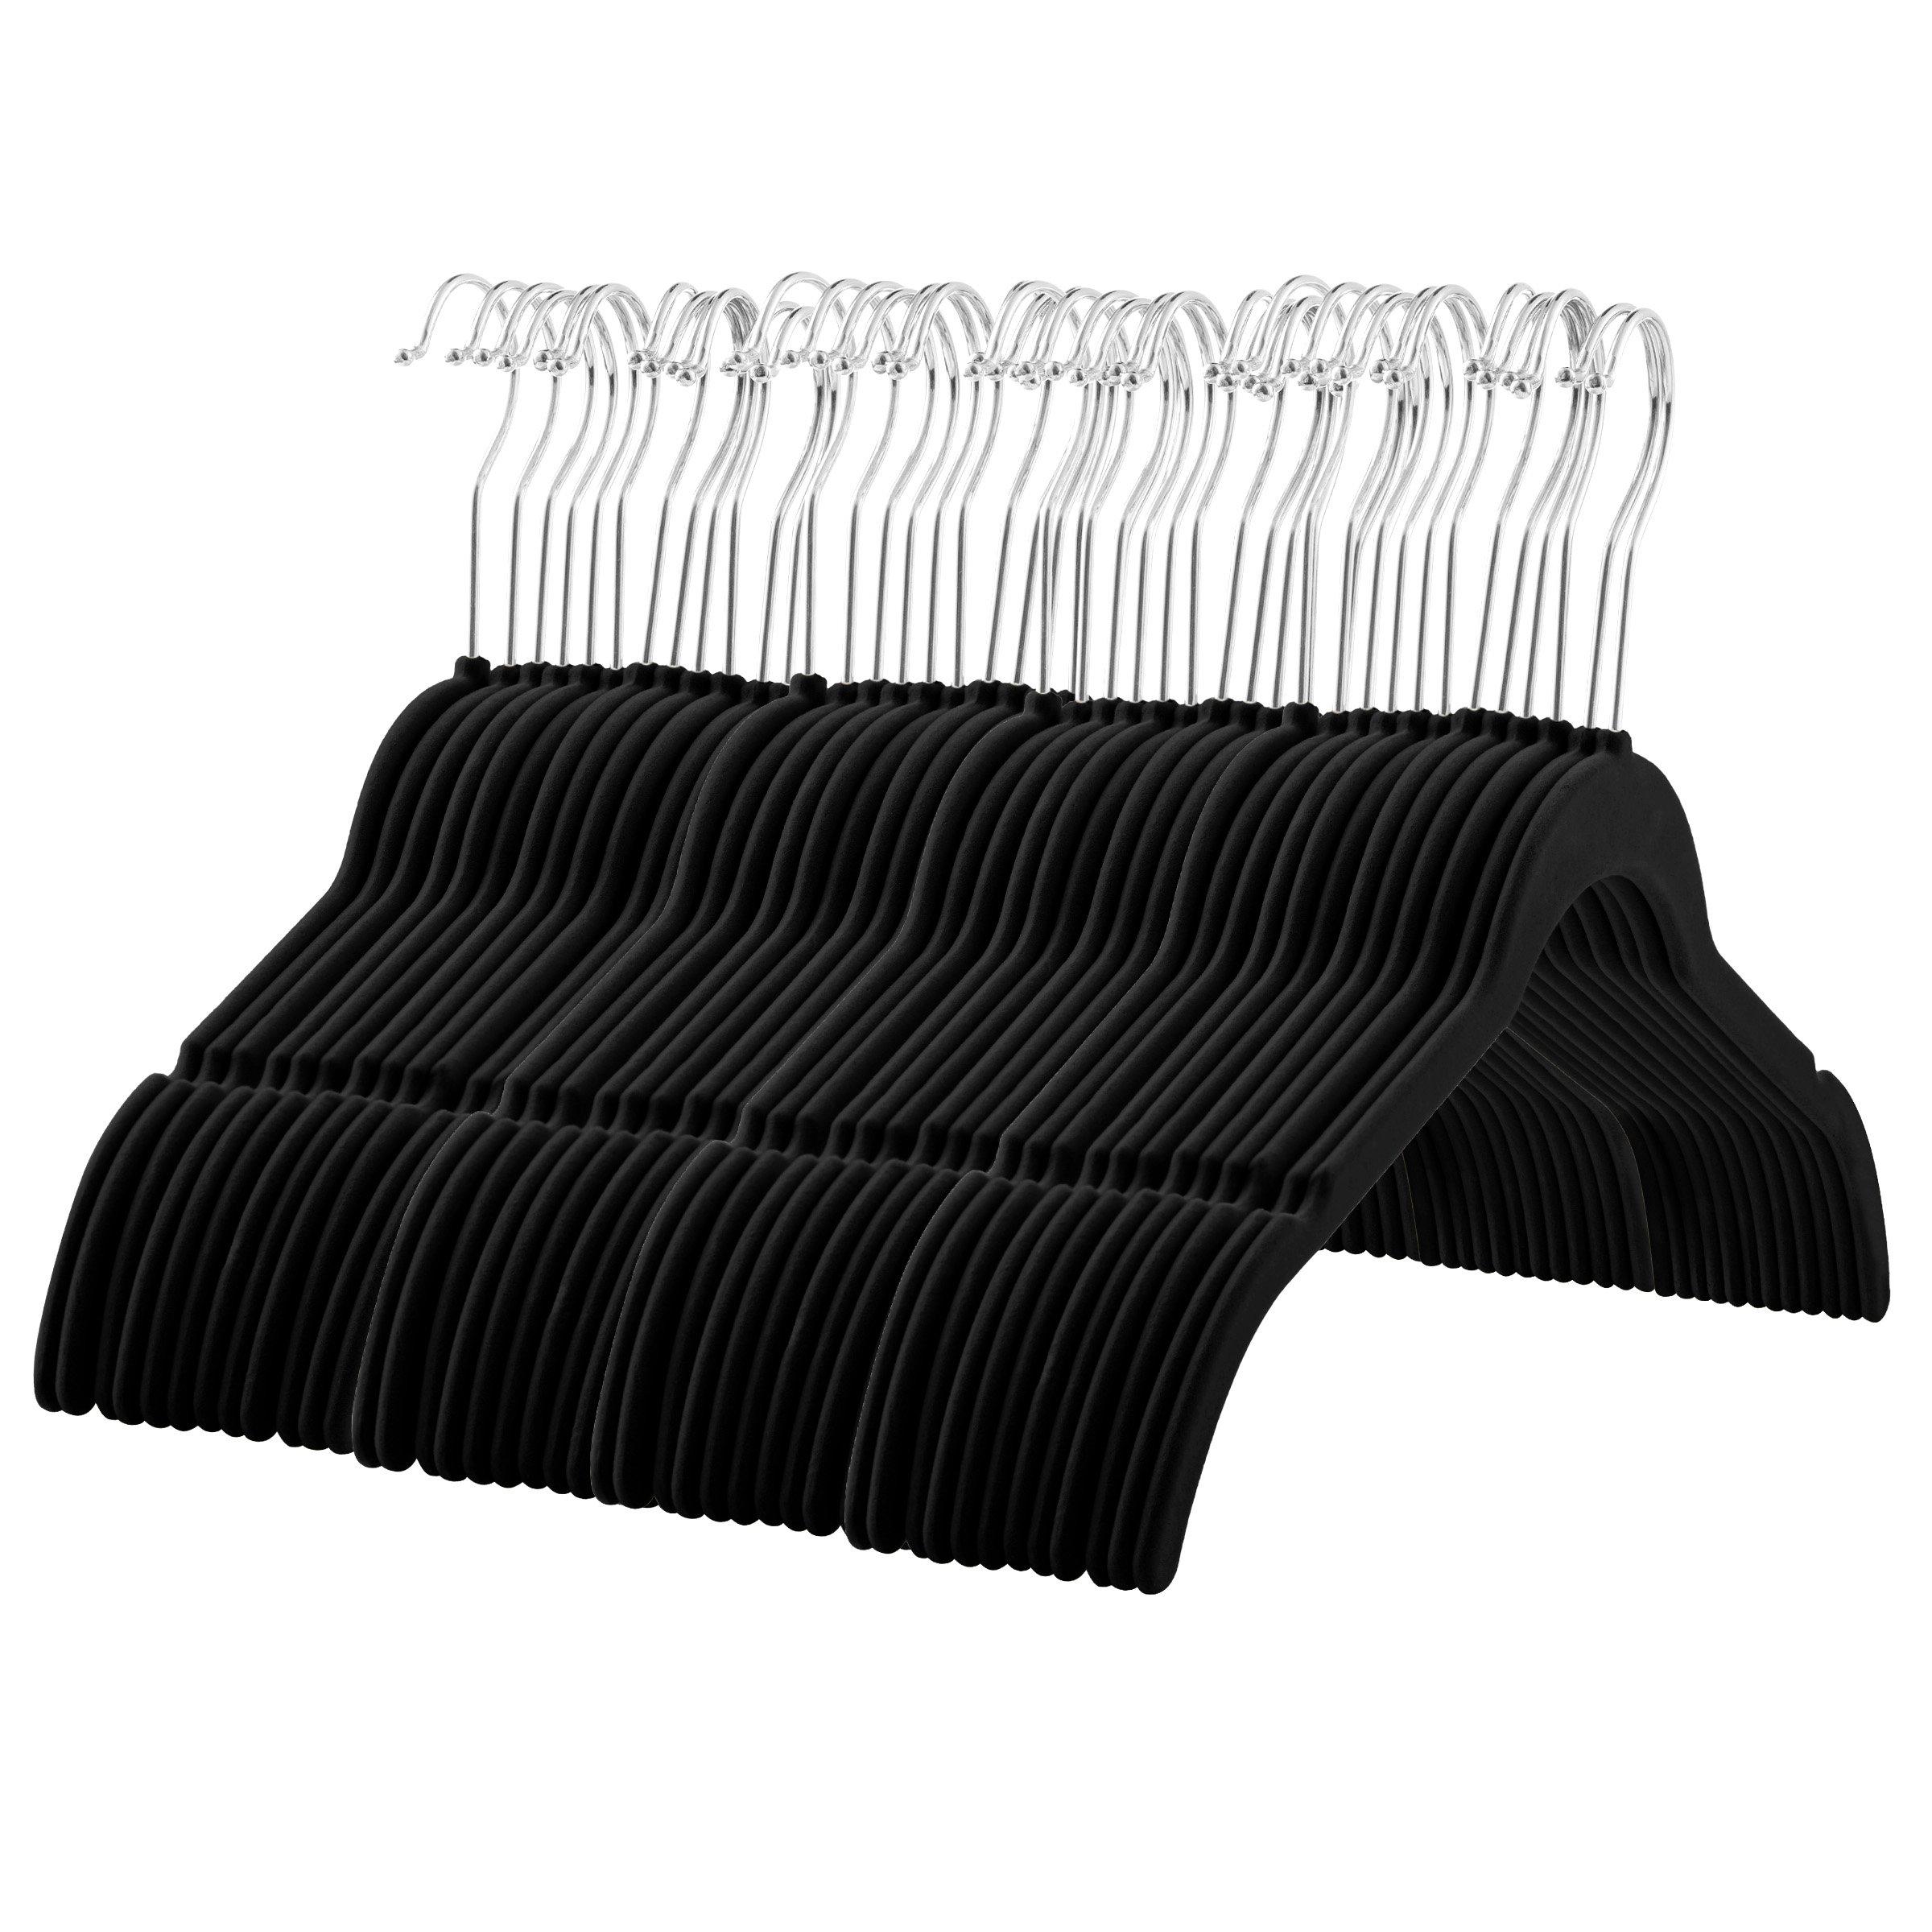 ZOBER Velvet Shirt/Dress Hangers - (60-Pack) Non-Slip Velvet Material, Contoured Shoulders and Notches, 360 Degree Swivel Hook, Ultra Thin Space Saving, for Shirts, Straps, Dresses, Camisoles, Etc